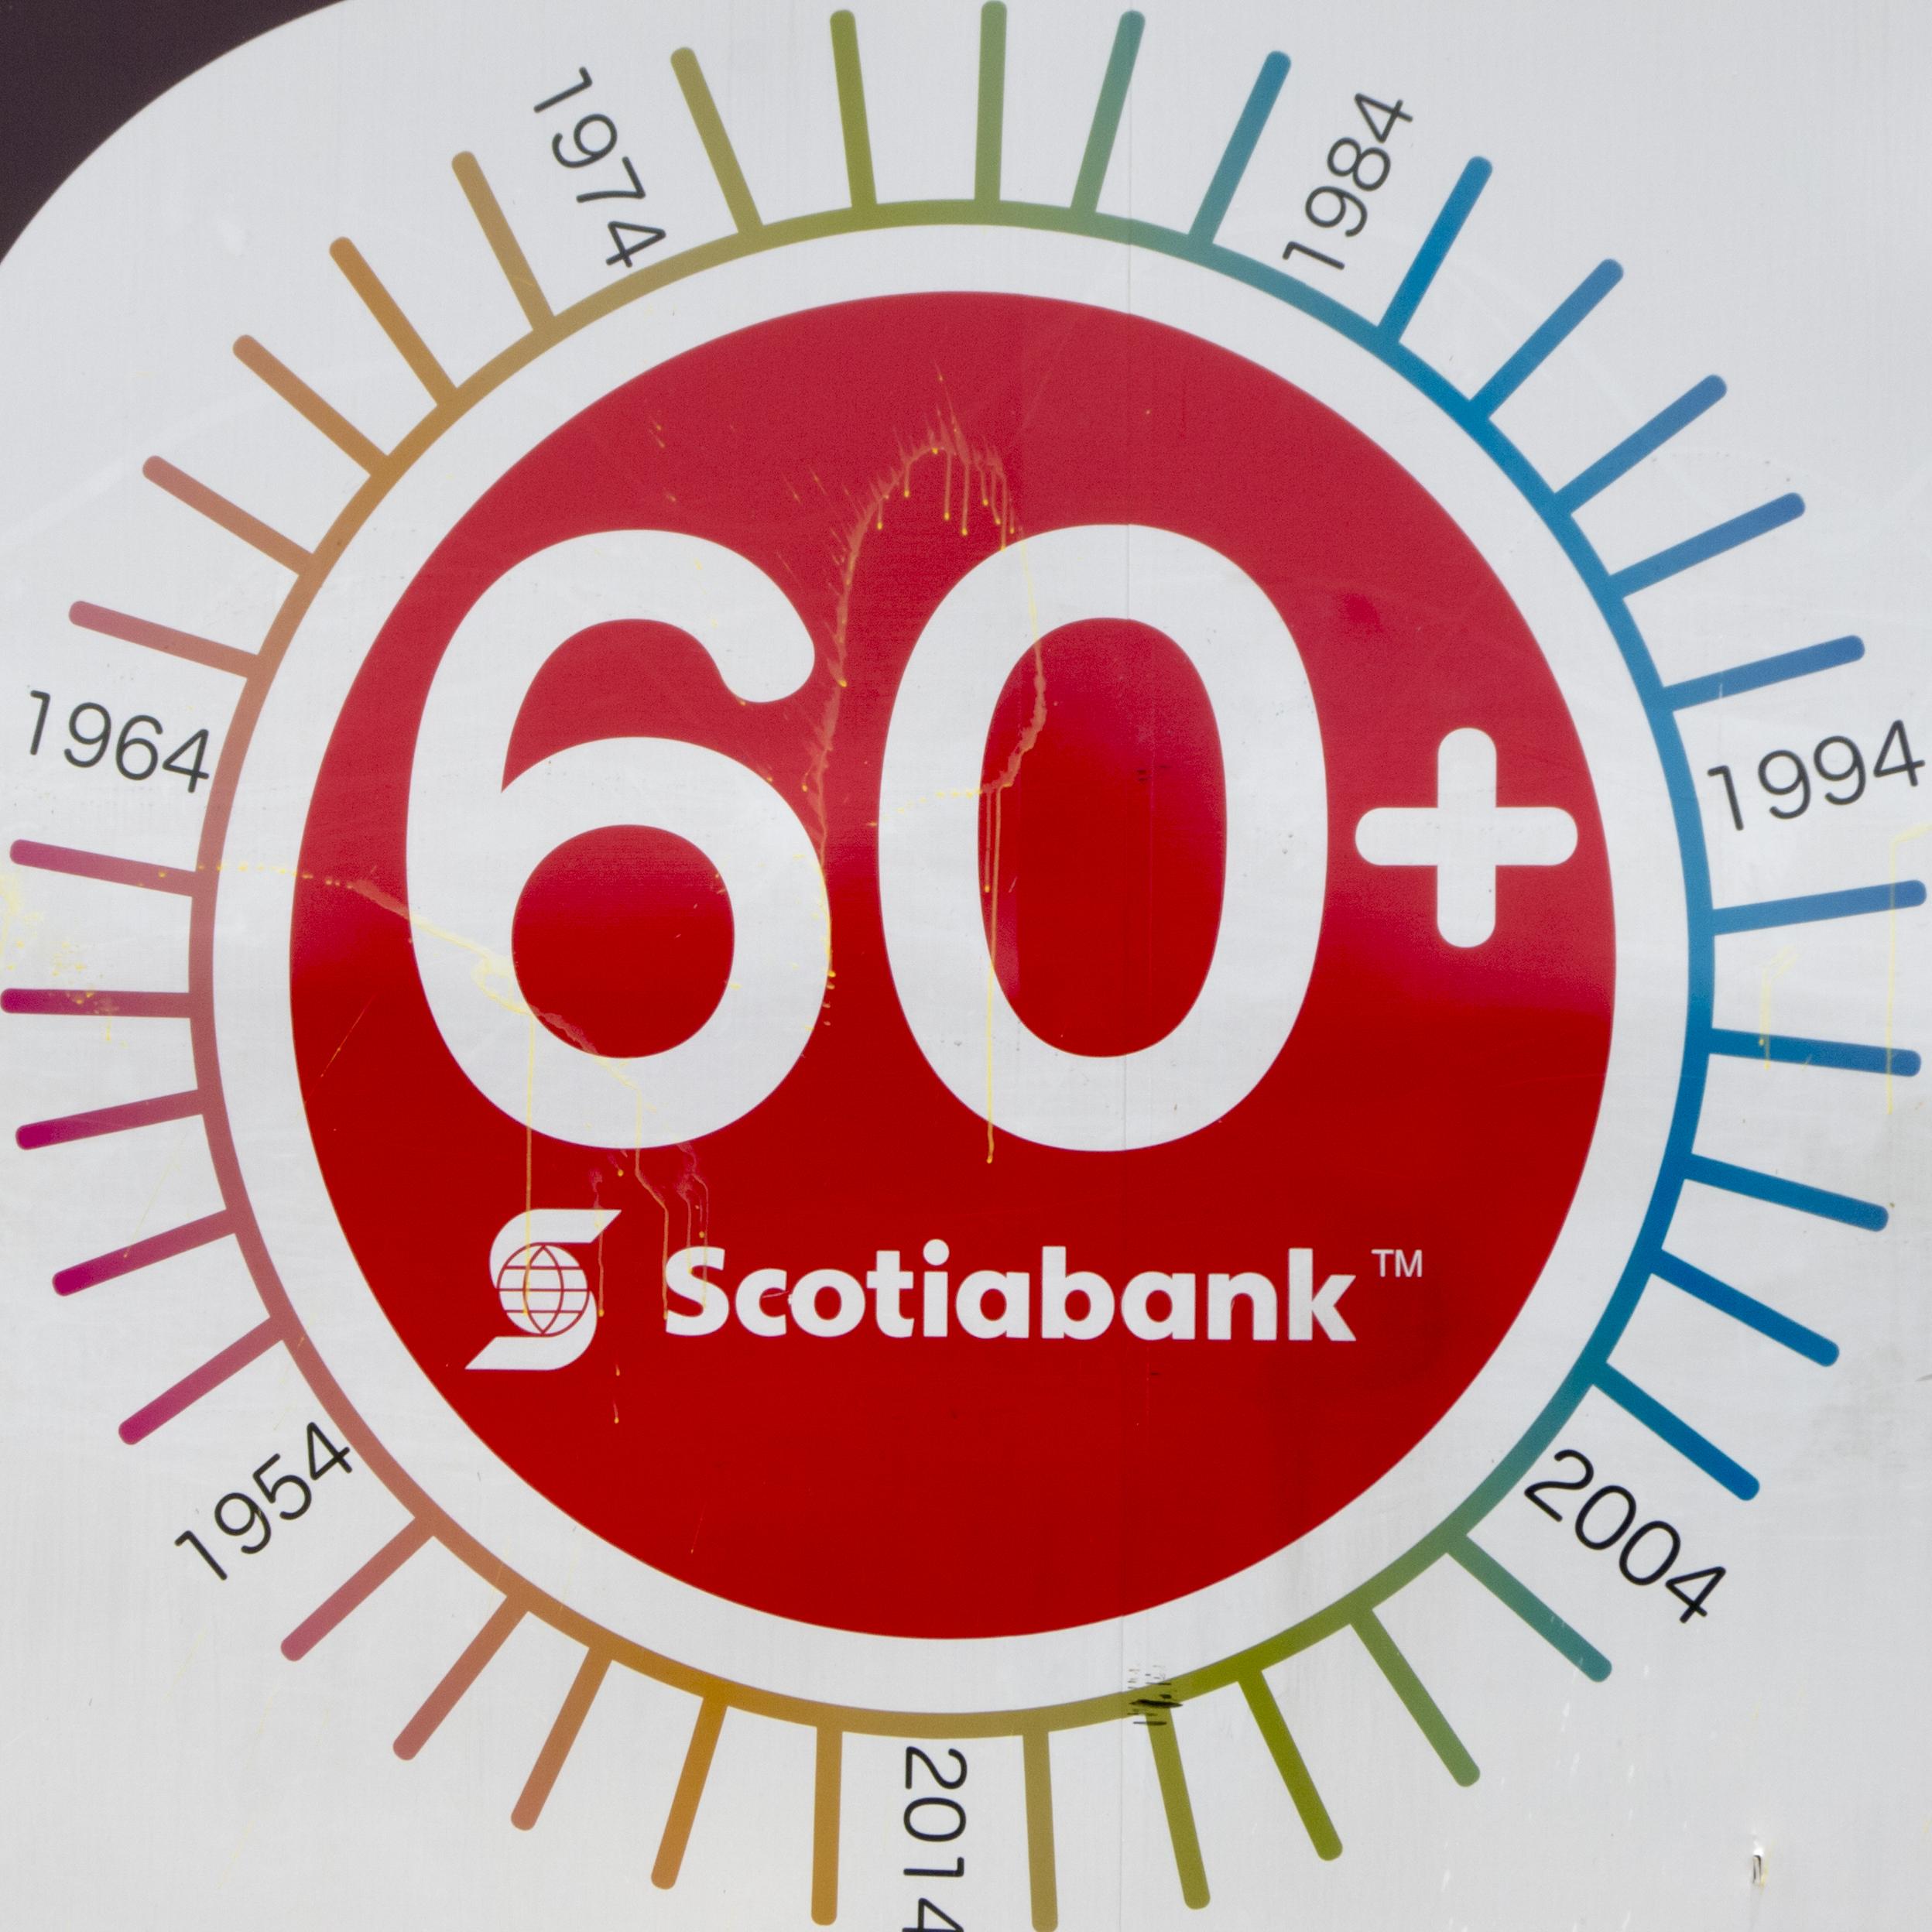 Scotia Bank